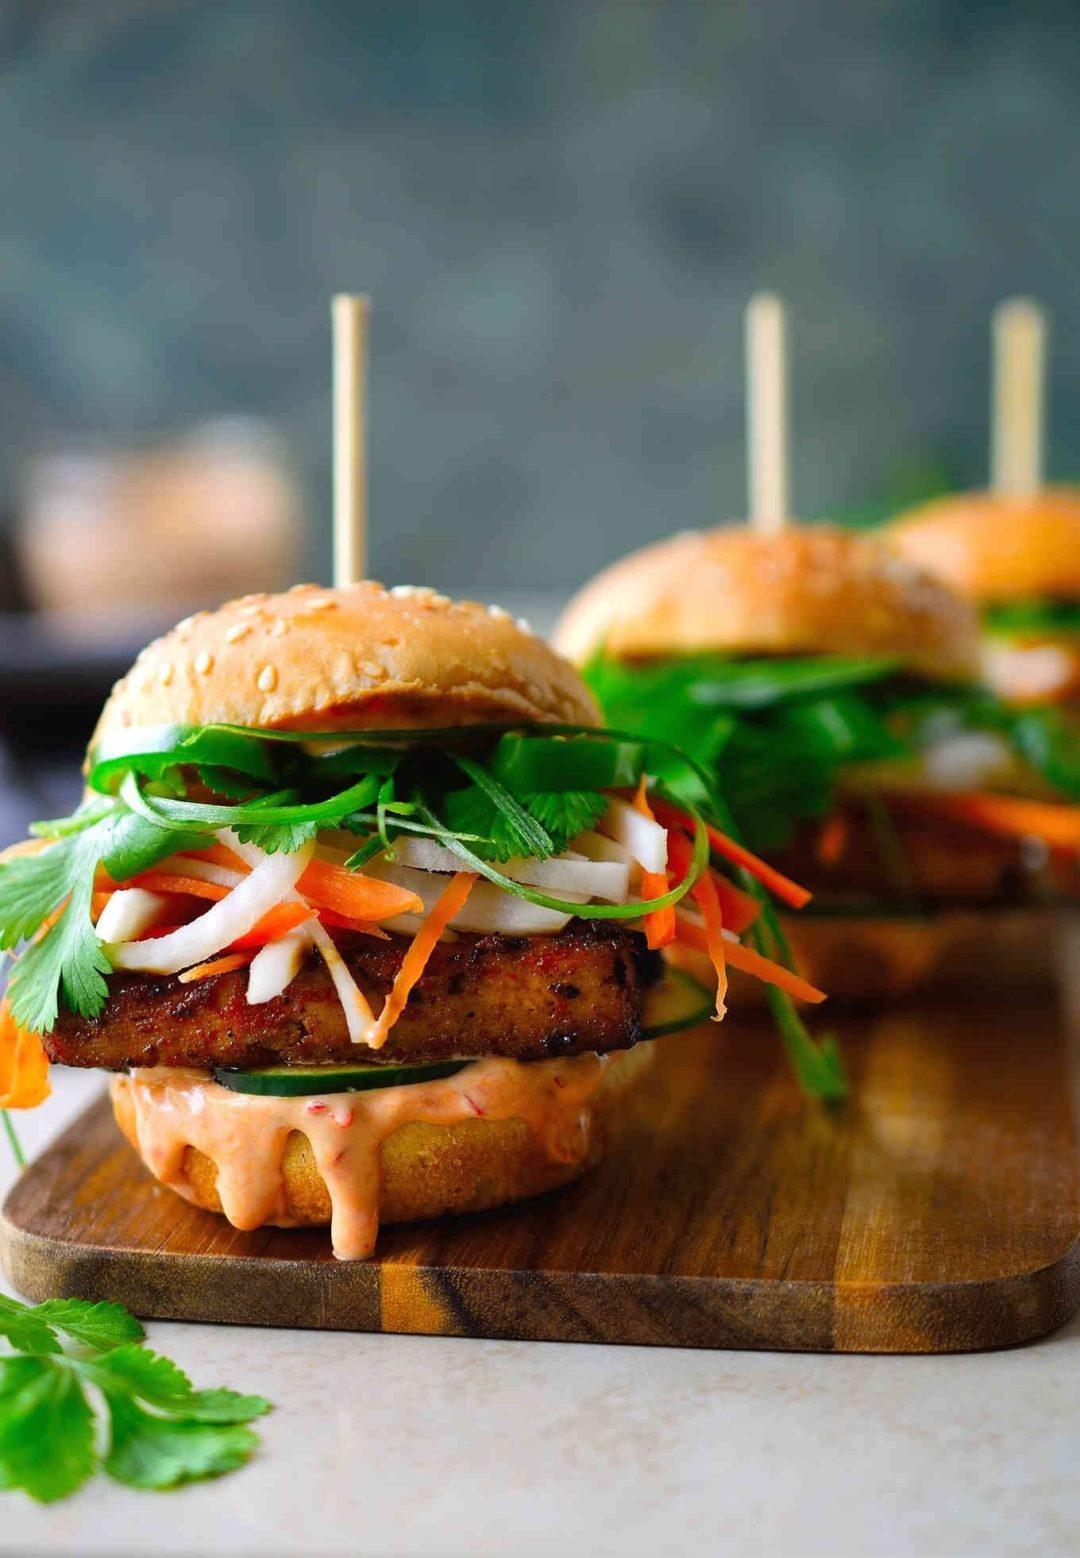 Hamburger végétalien au tofu fumé